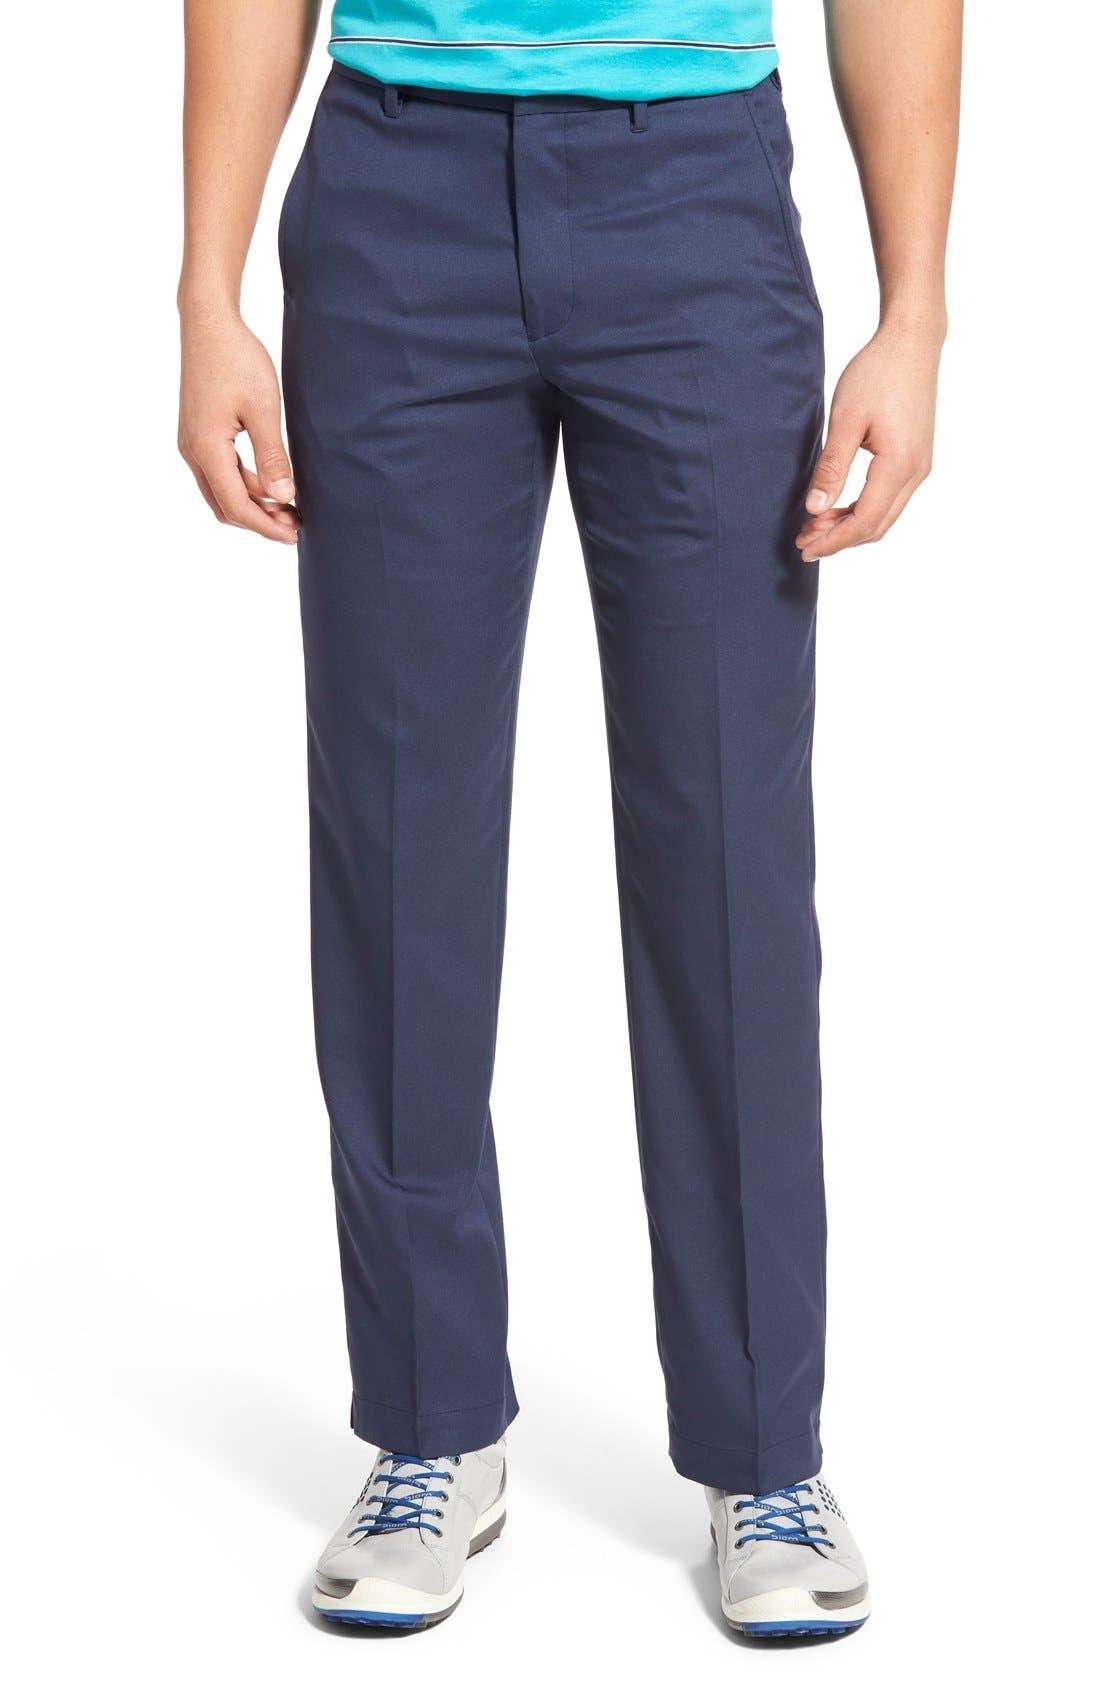 Main Image - Bobby Jones 'Tech' Flat Front Wrinkle Free Golf Pants